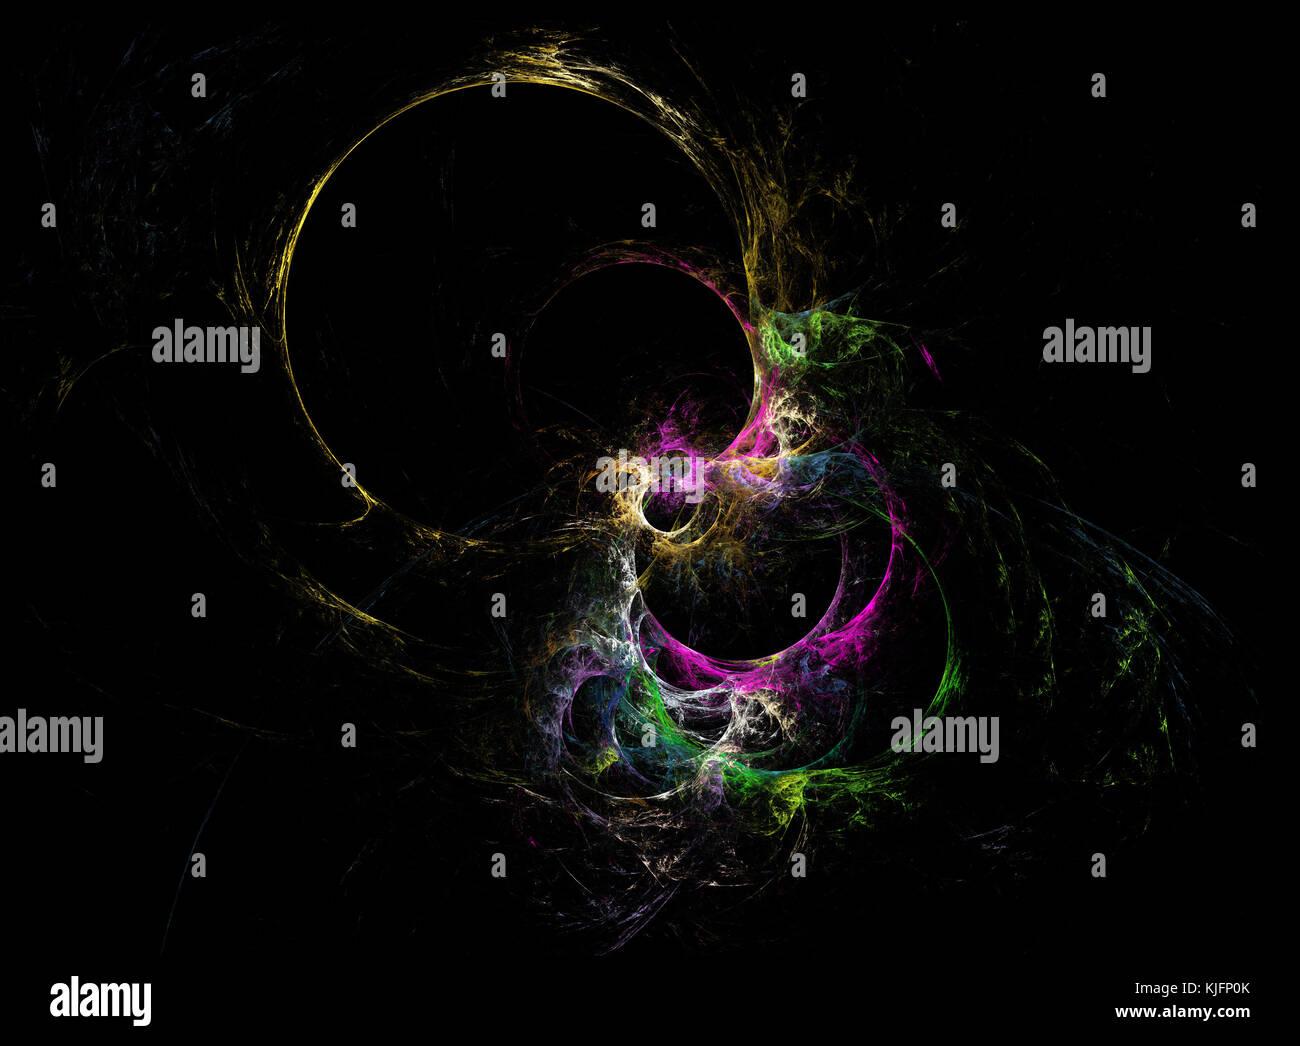 Fractal design. Creation light and dark. - Stock Image